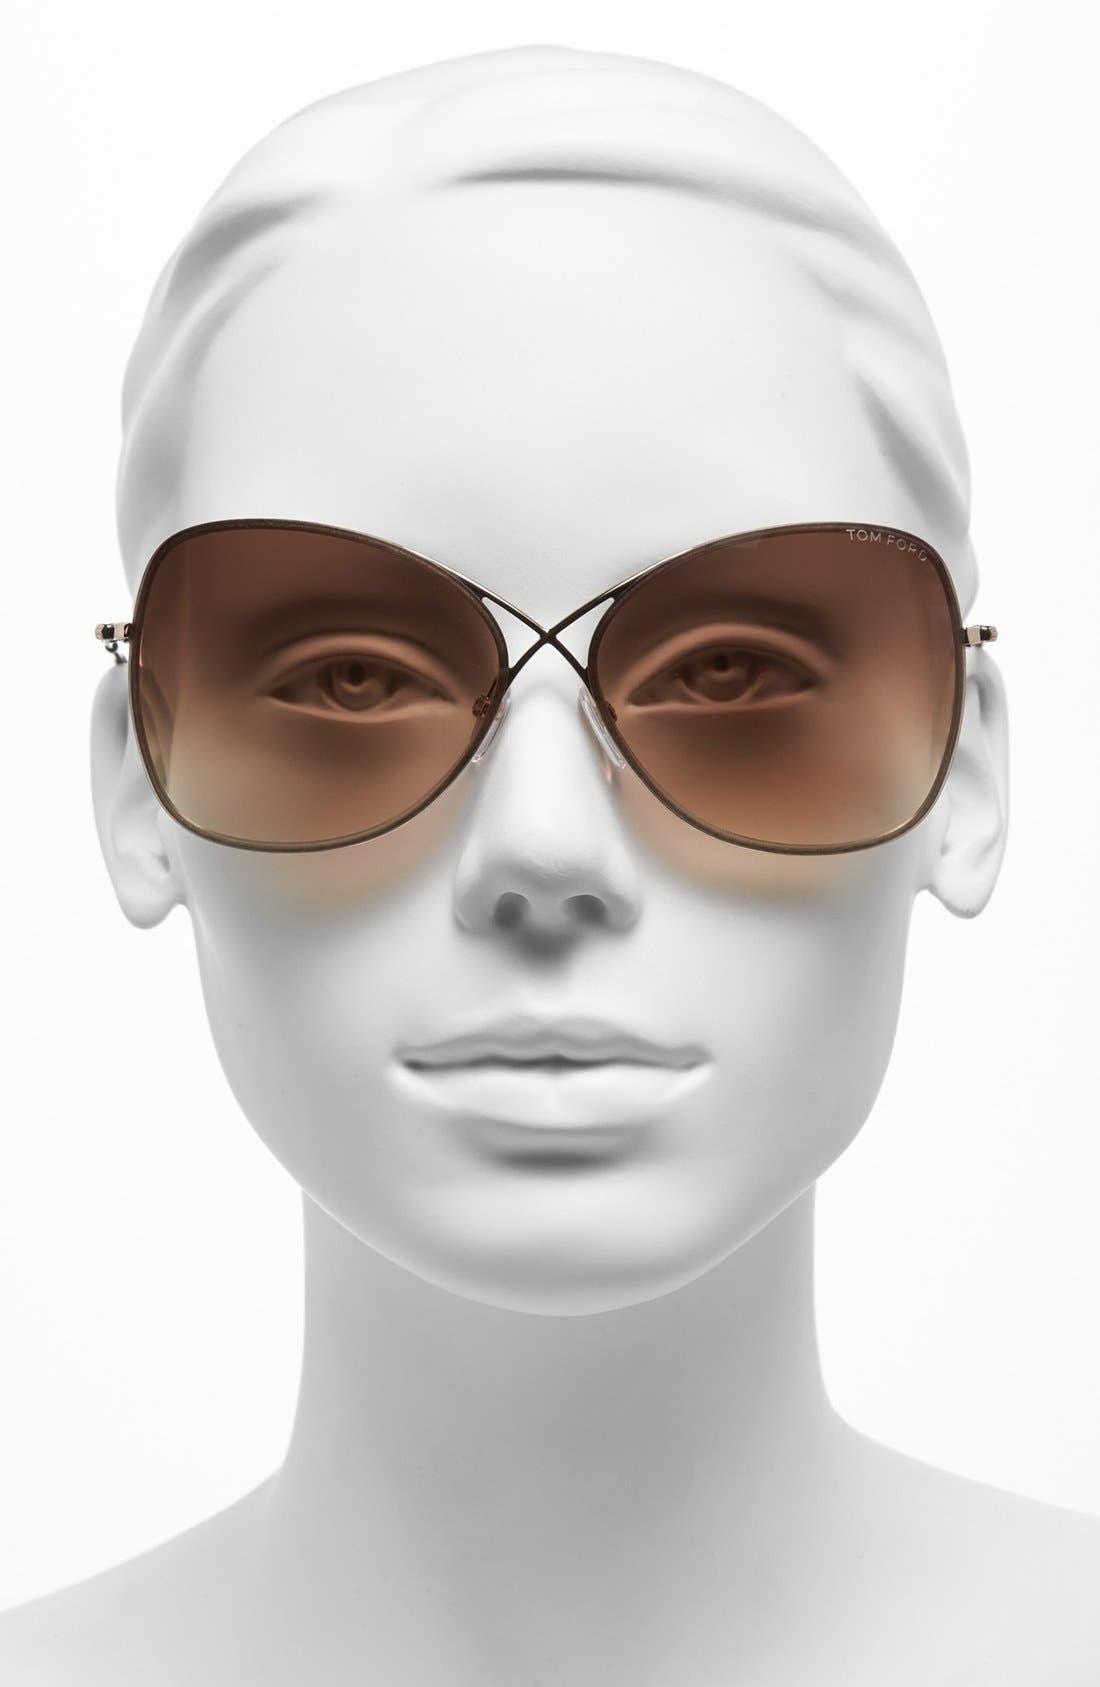 TOM FORD, 'Colette' 63mm Oversize Sunglasses, Alternate thumbnail 2, color, SHINY ROSE GOLD/ DARK BROWN